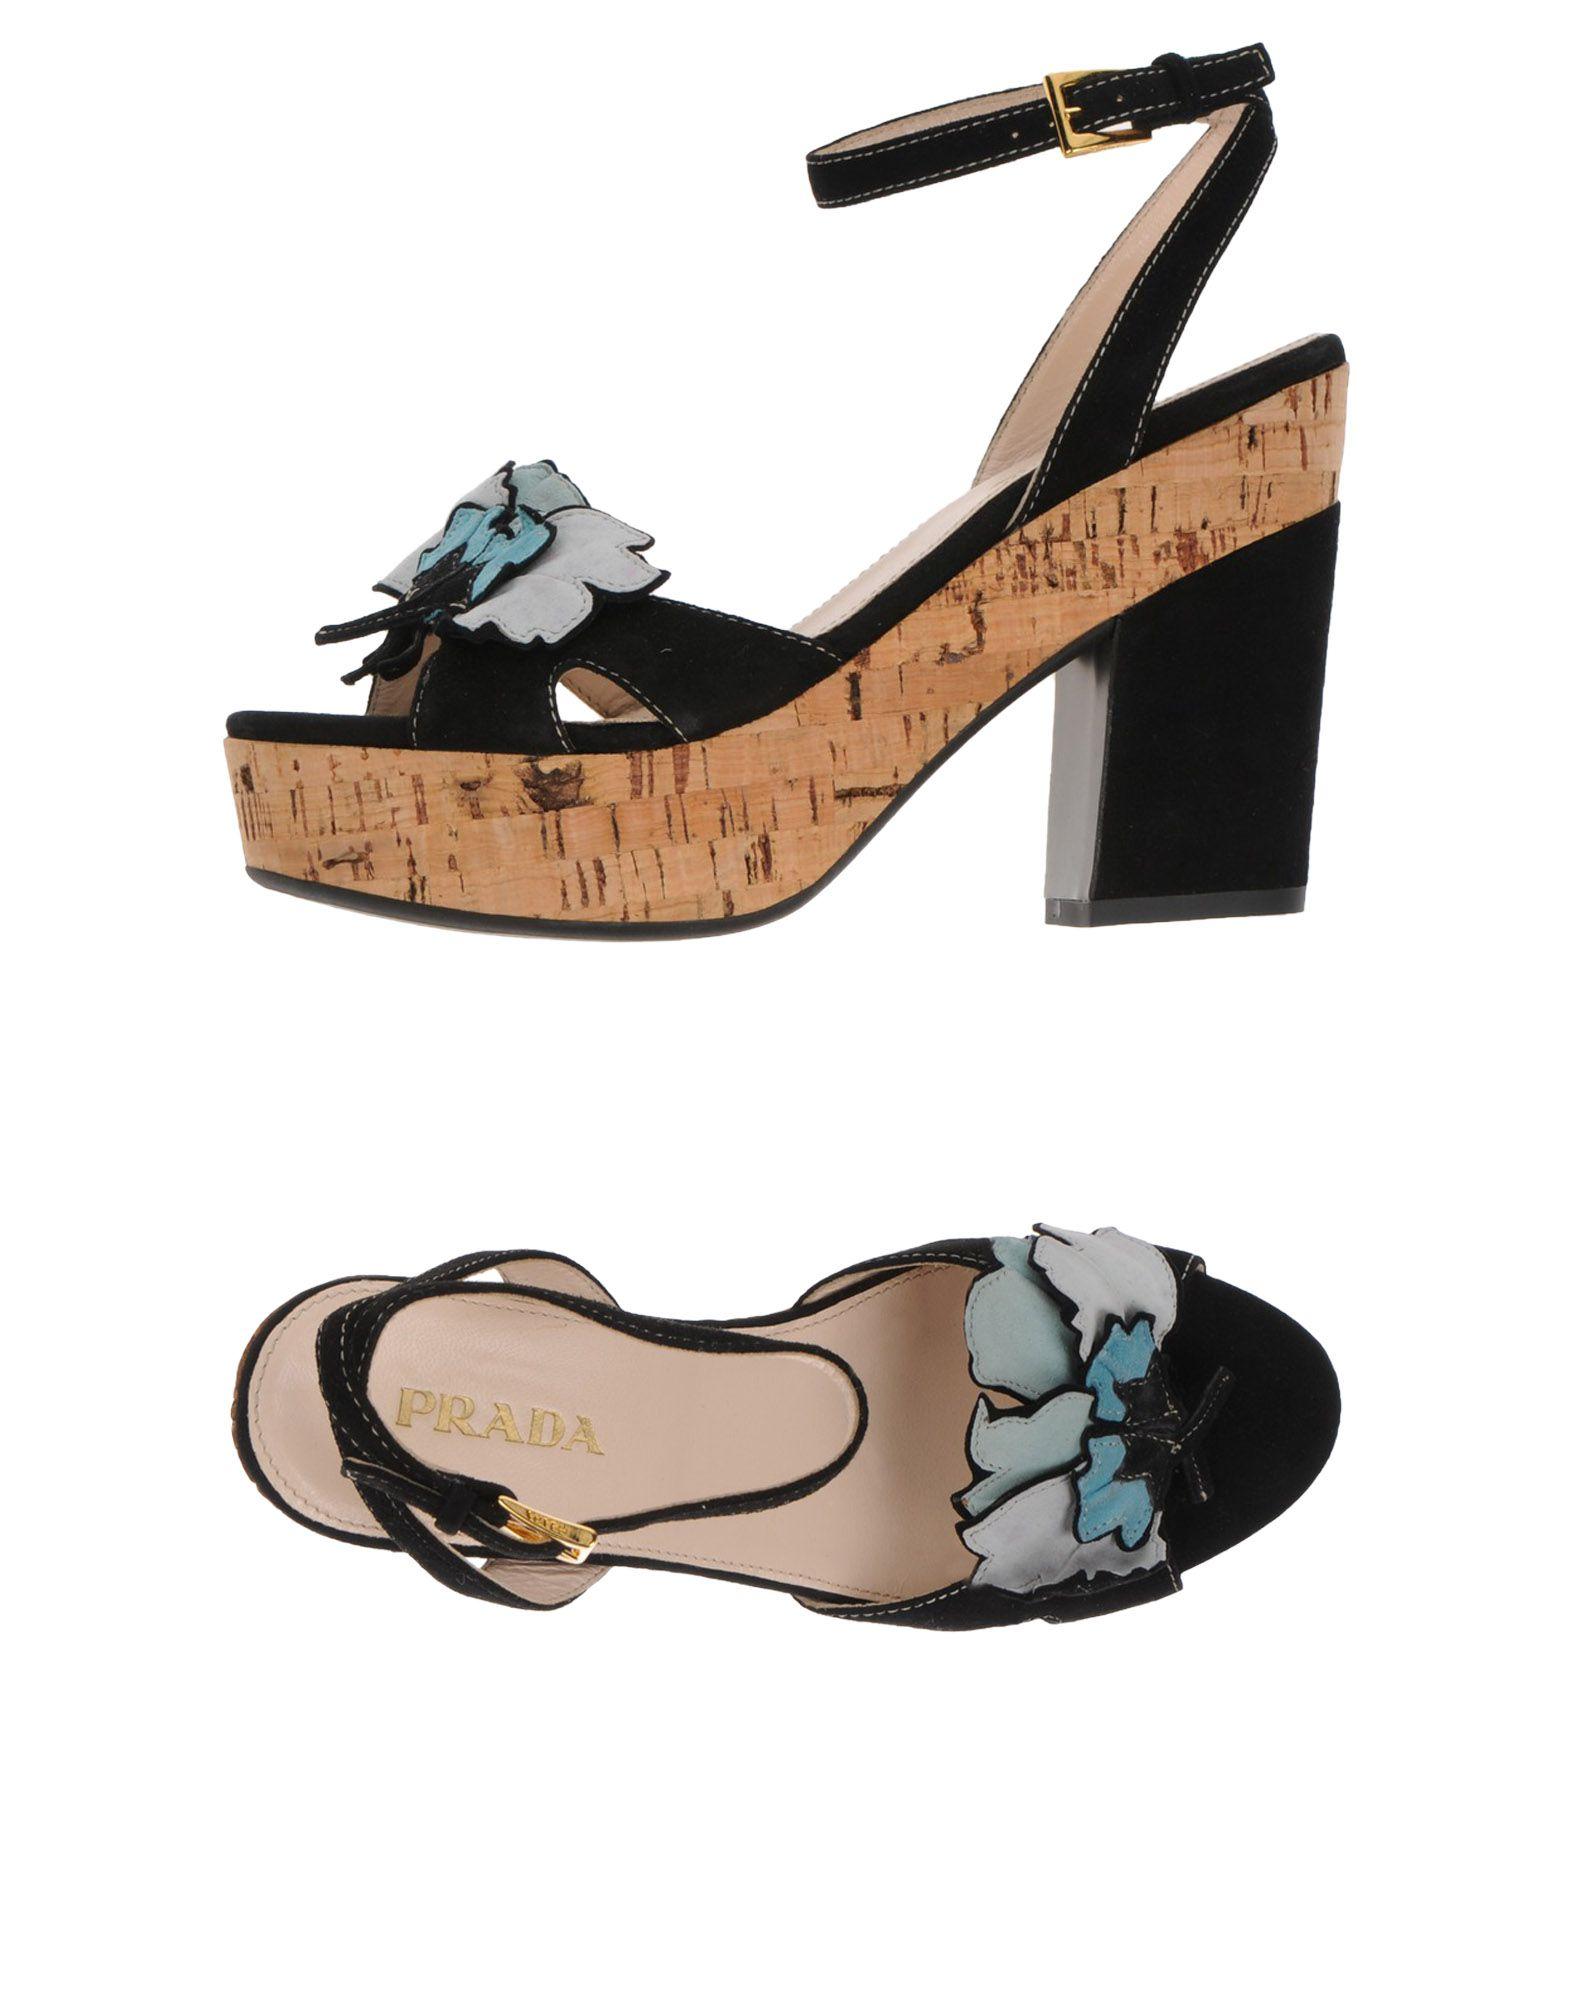 Moda Sandali Prada Donna Donna Prada - 11379270FW 529333